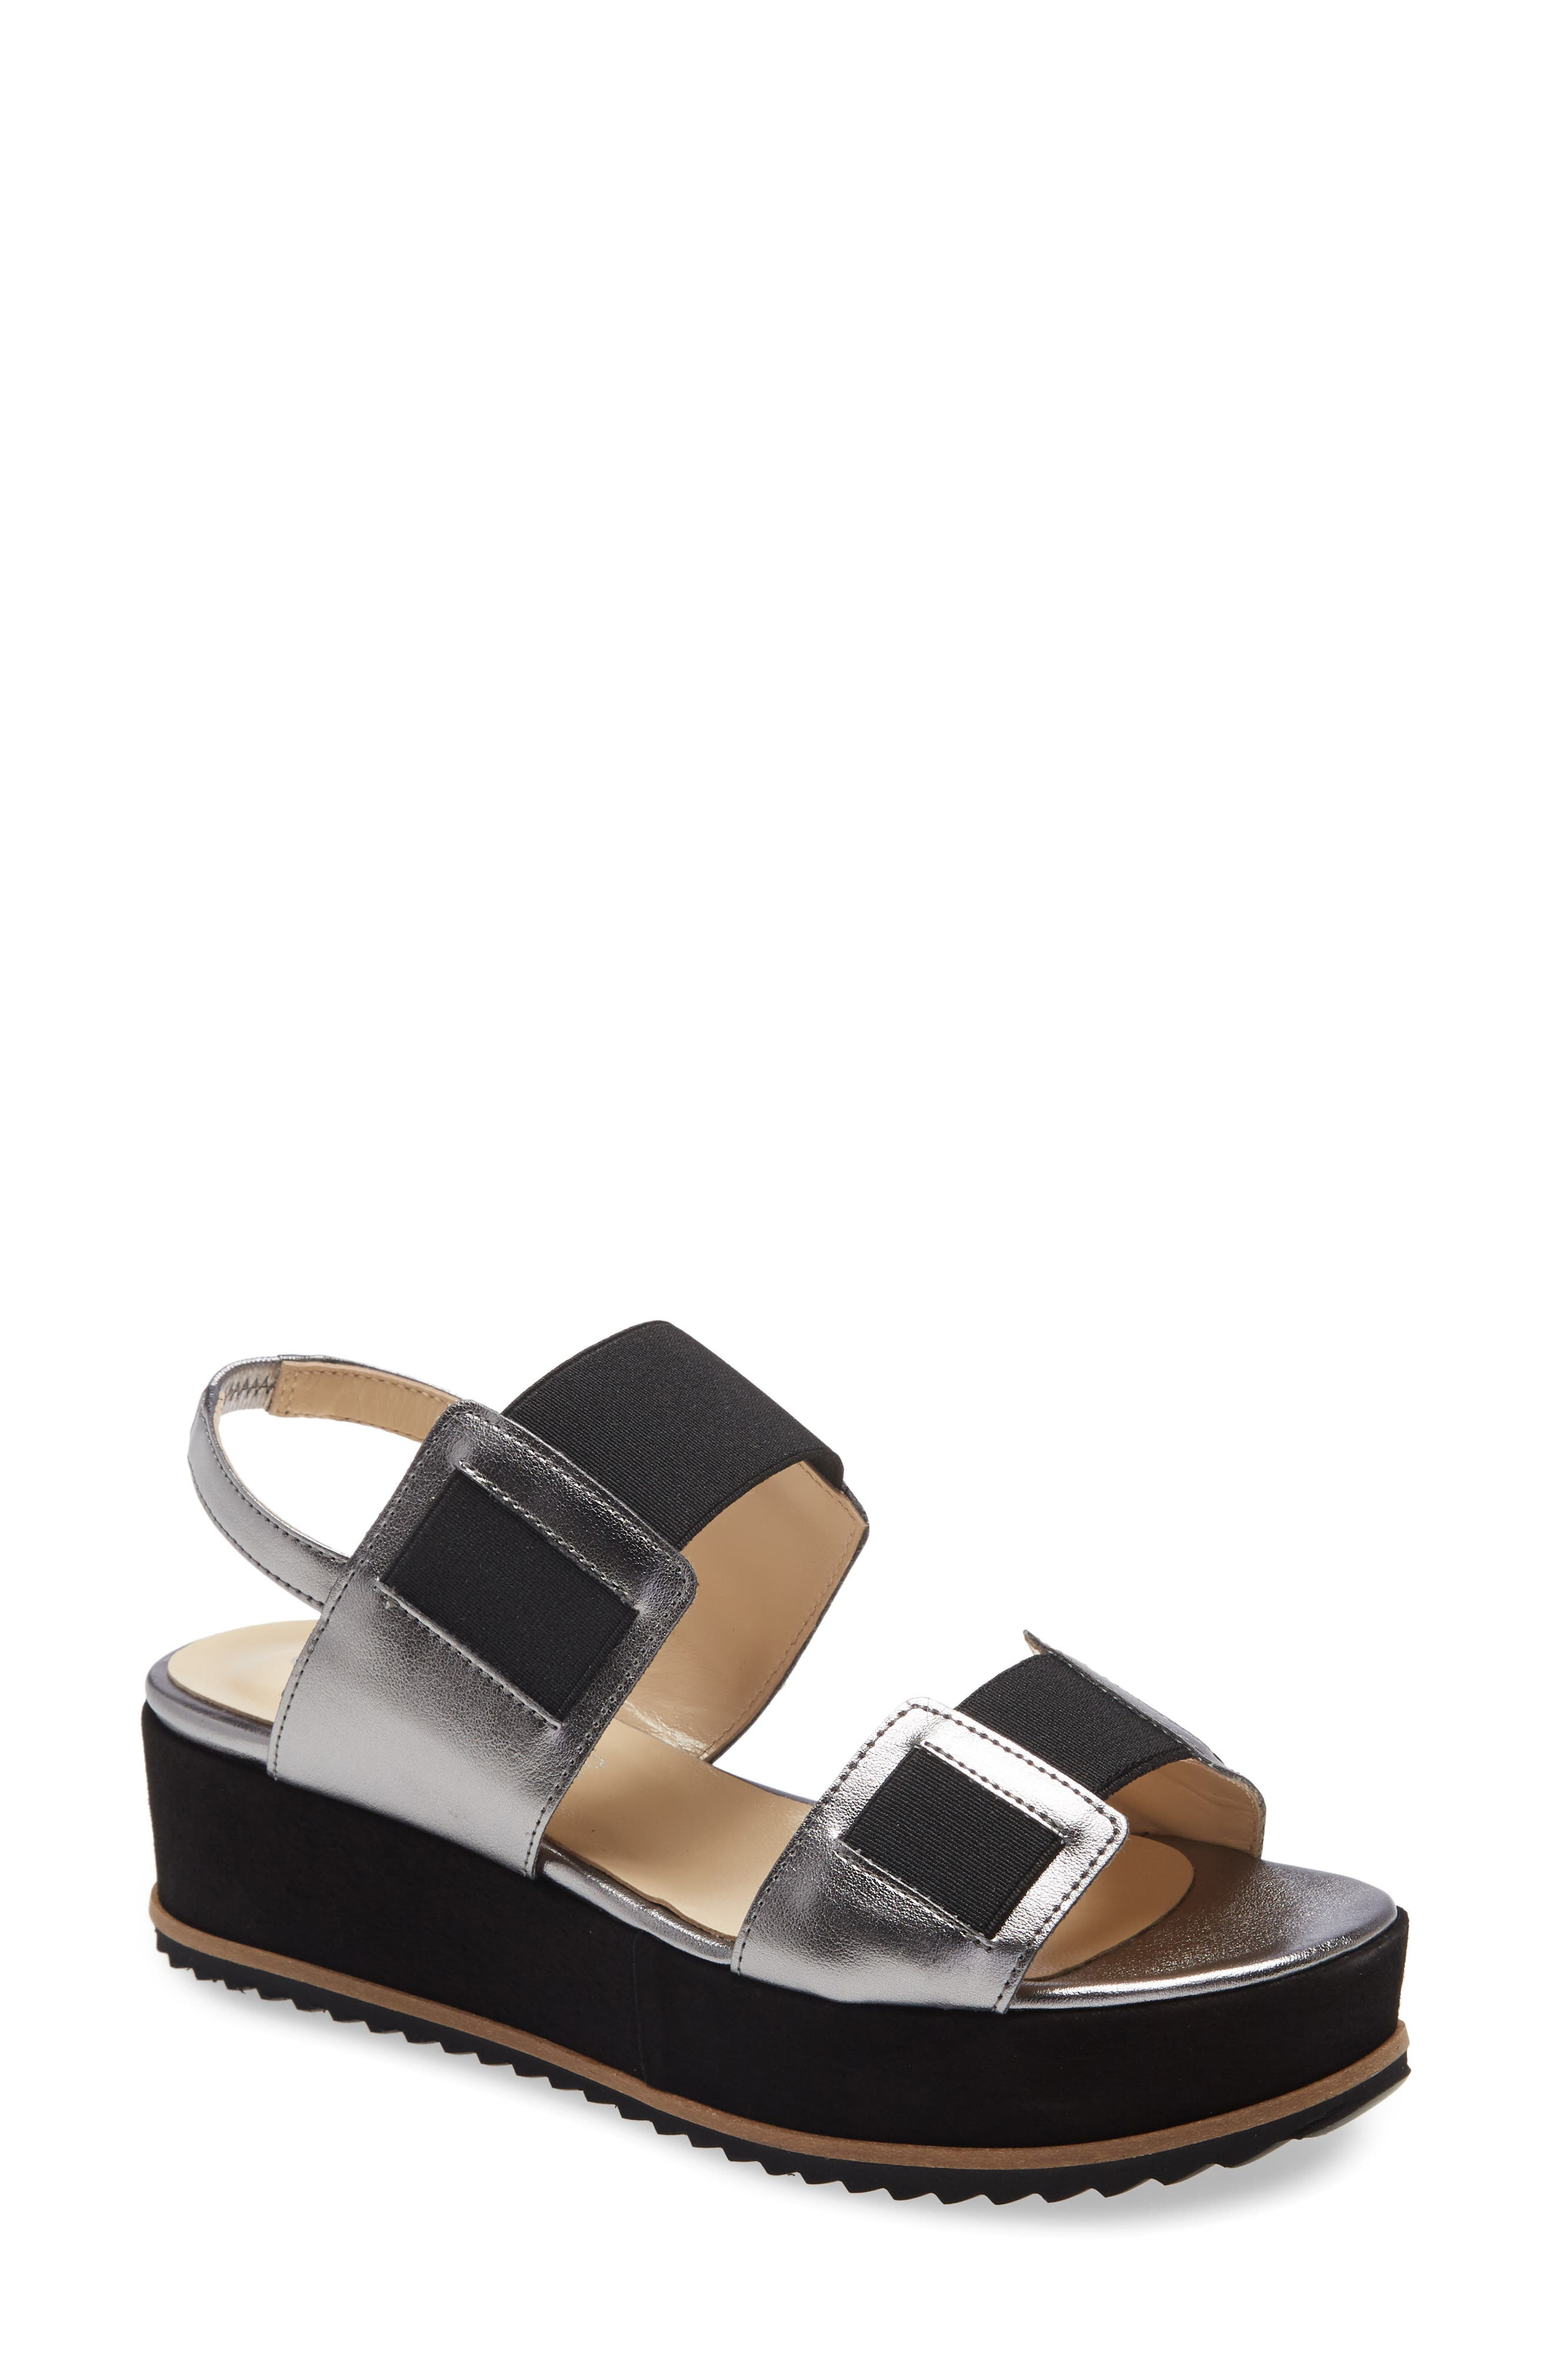 Katia Platform Sandal